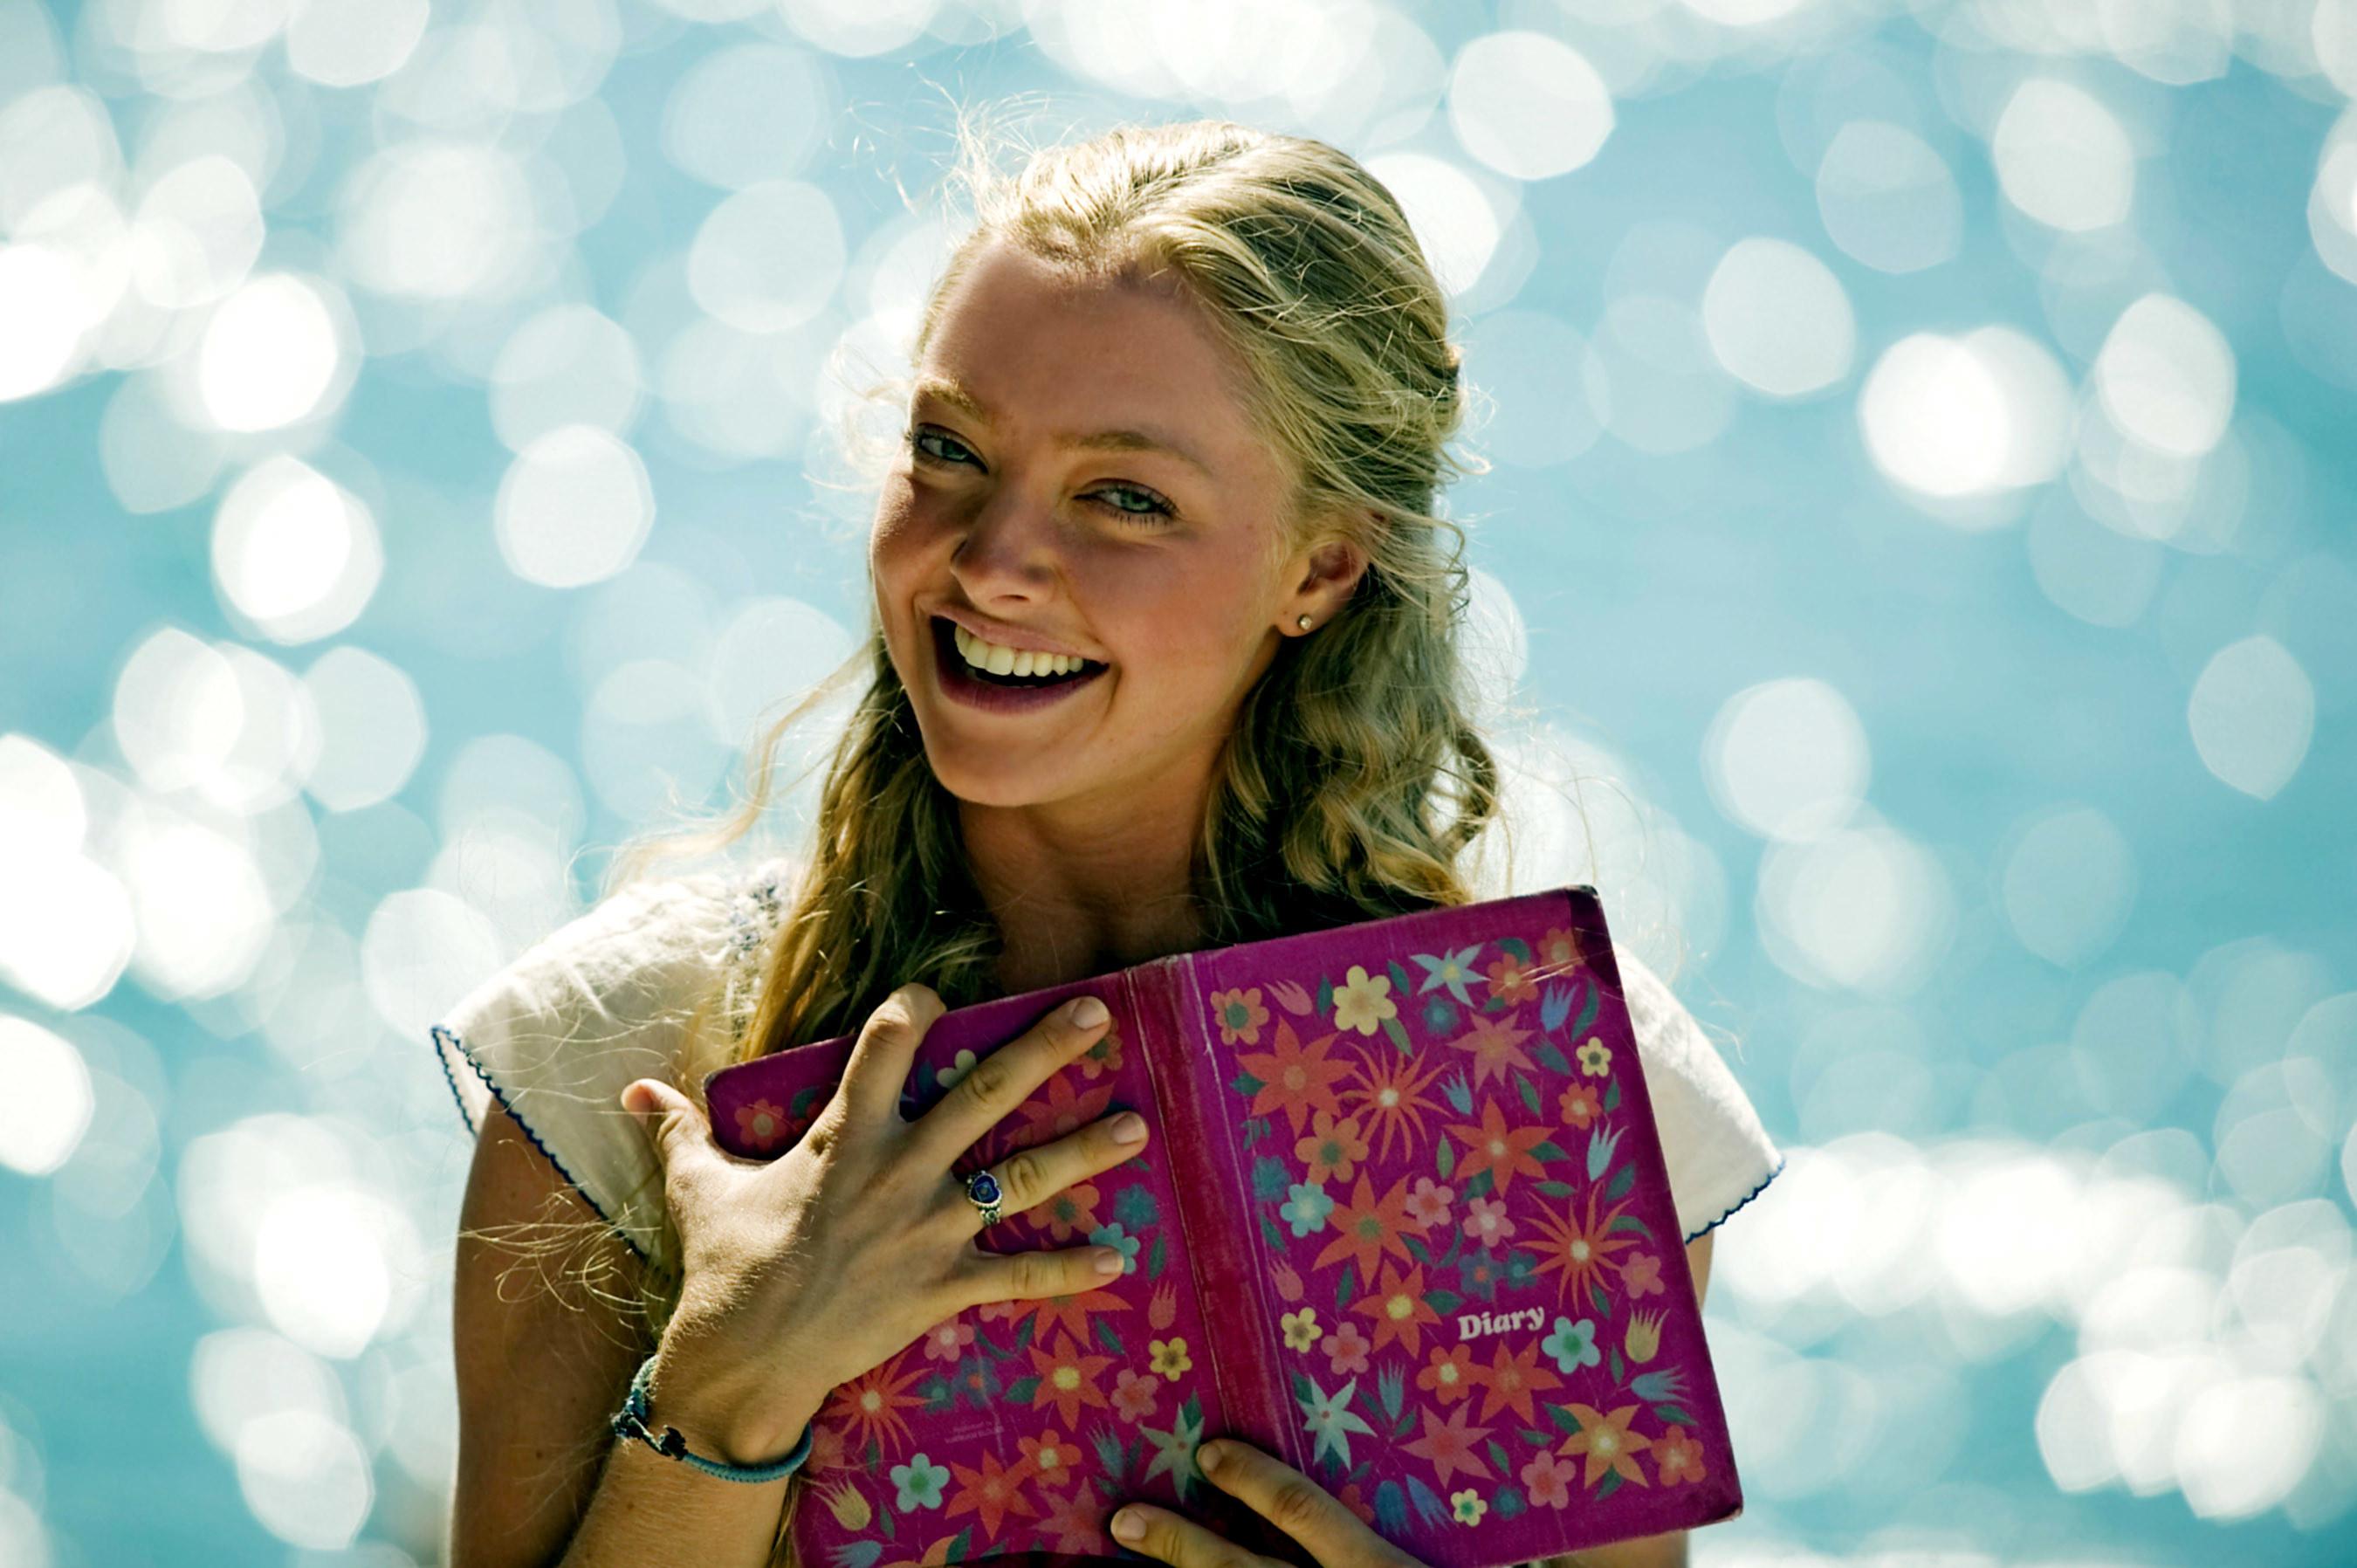 Amanda Seyfried holding a diary.